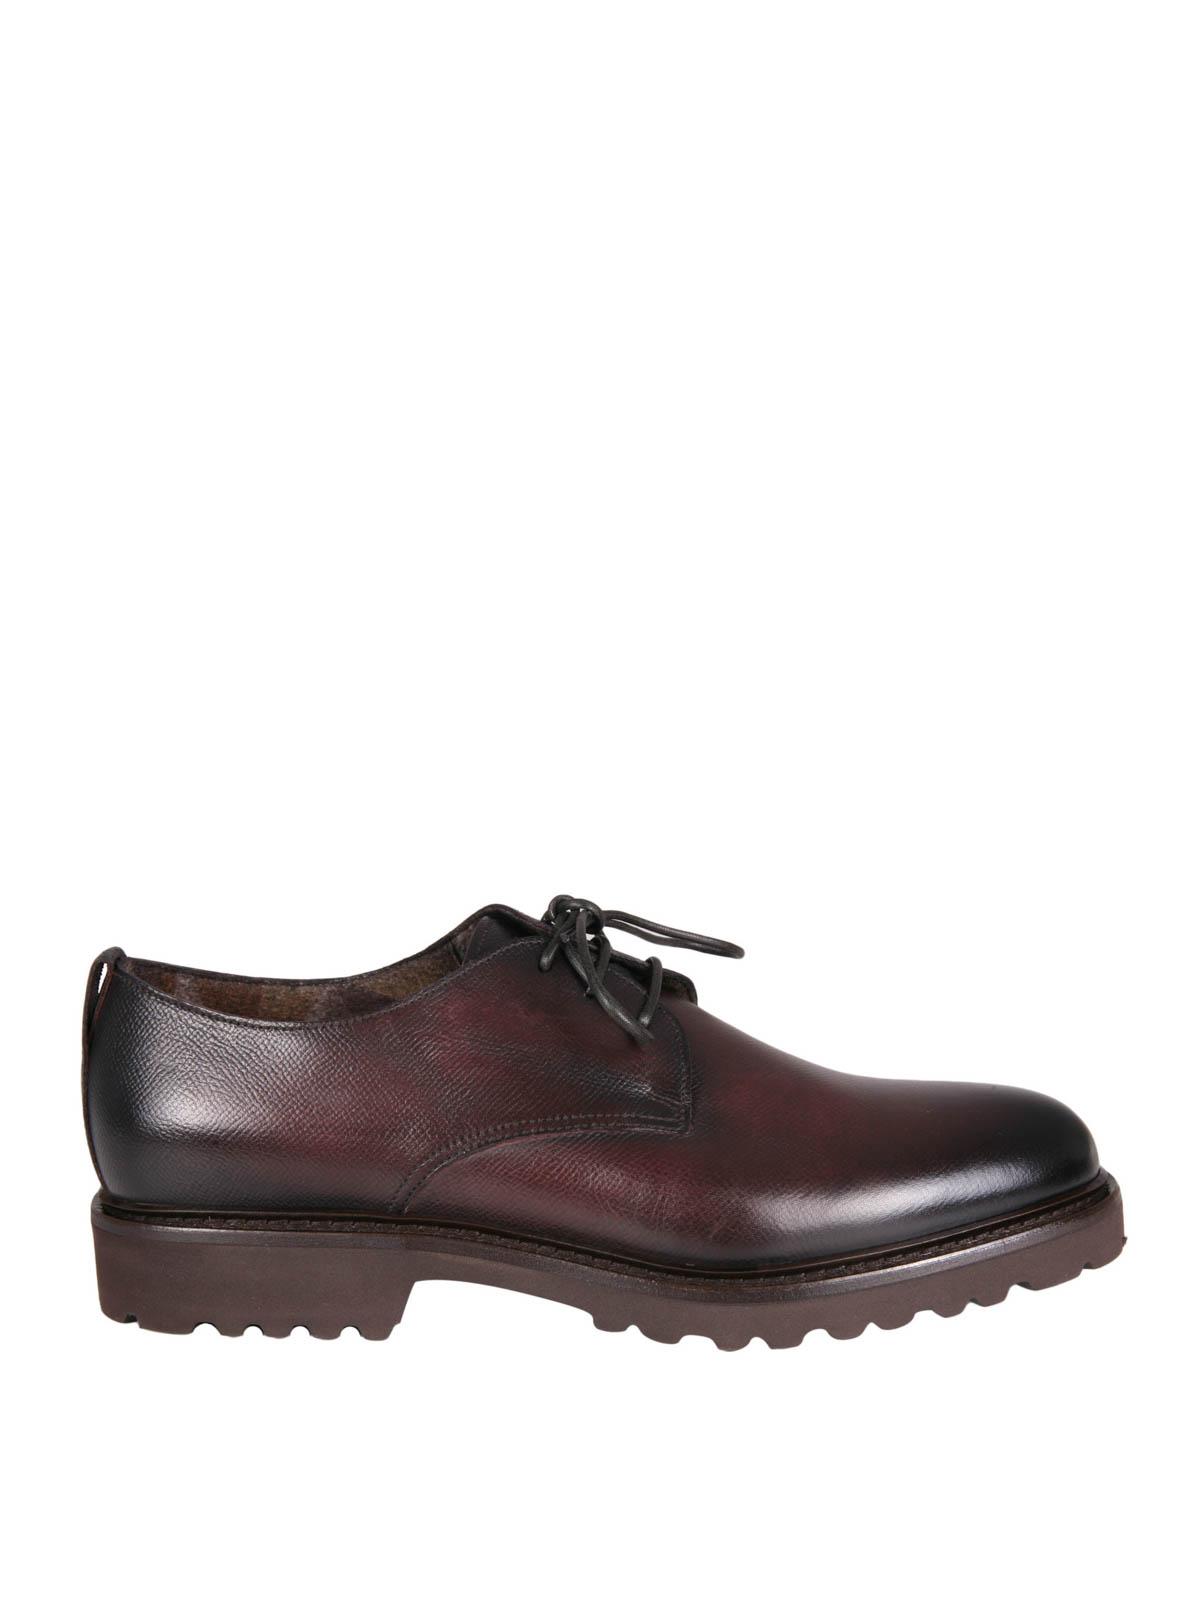 Stringate in pelle martellata doucal 39 s scarpe stringate for Scarpe manolo blahnik shop on line